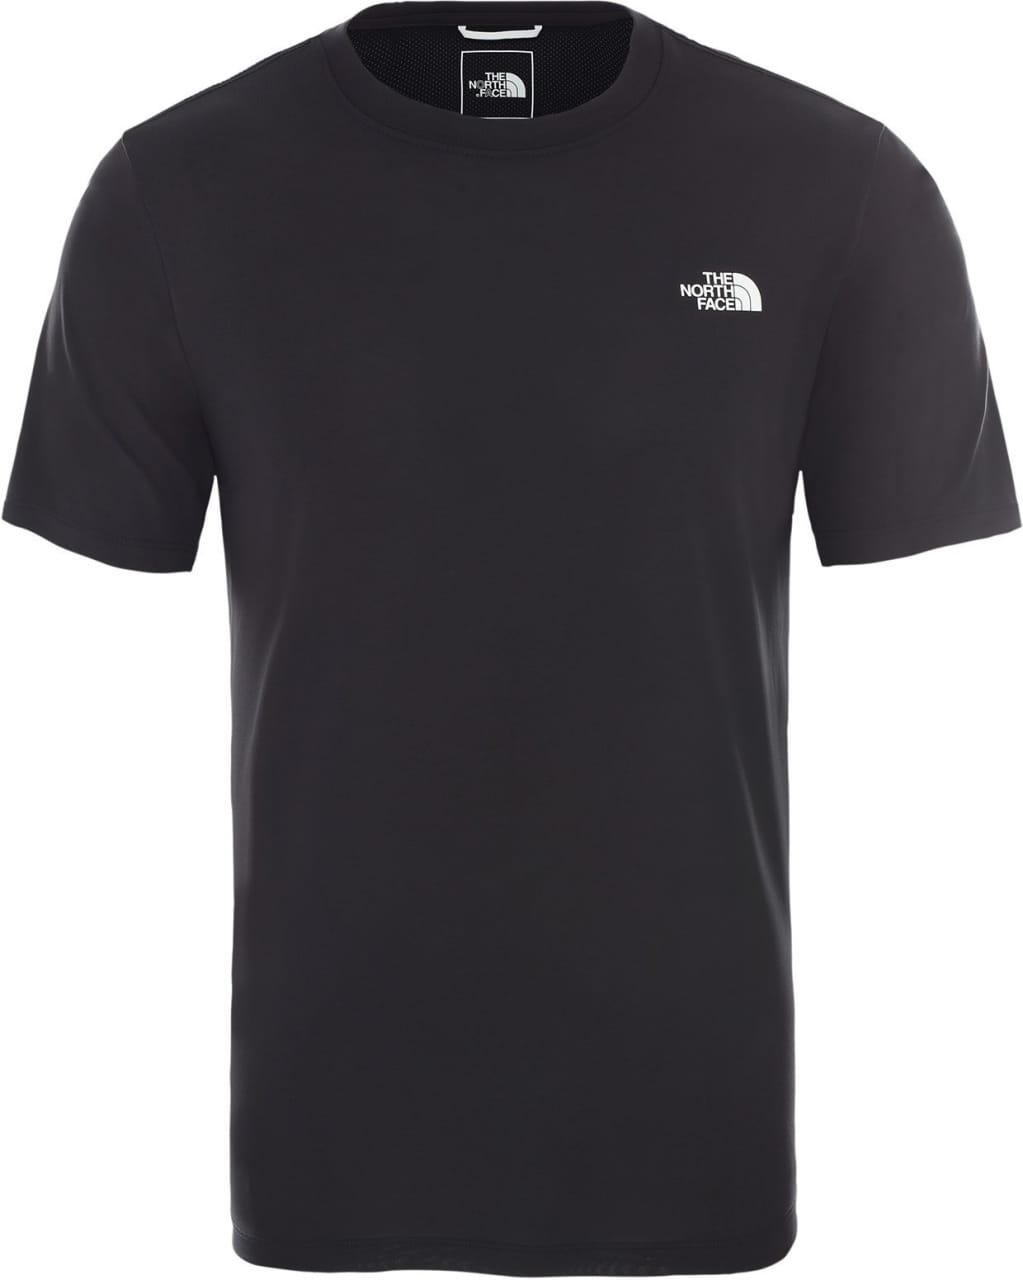 T-Shirts The North Face Men's Train N Logo T-Shirt